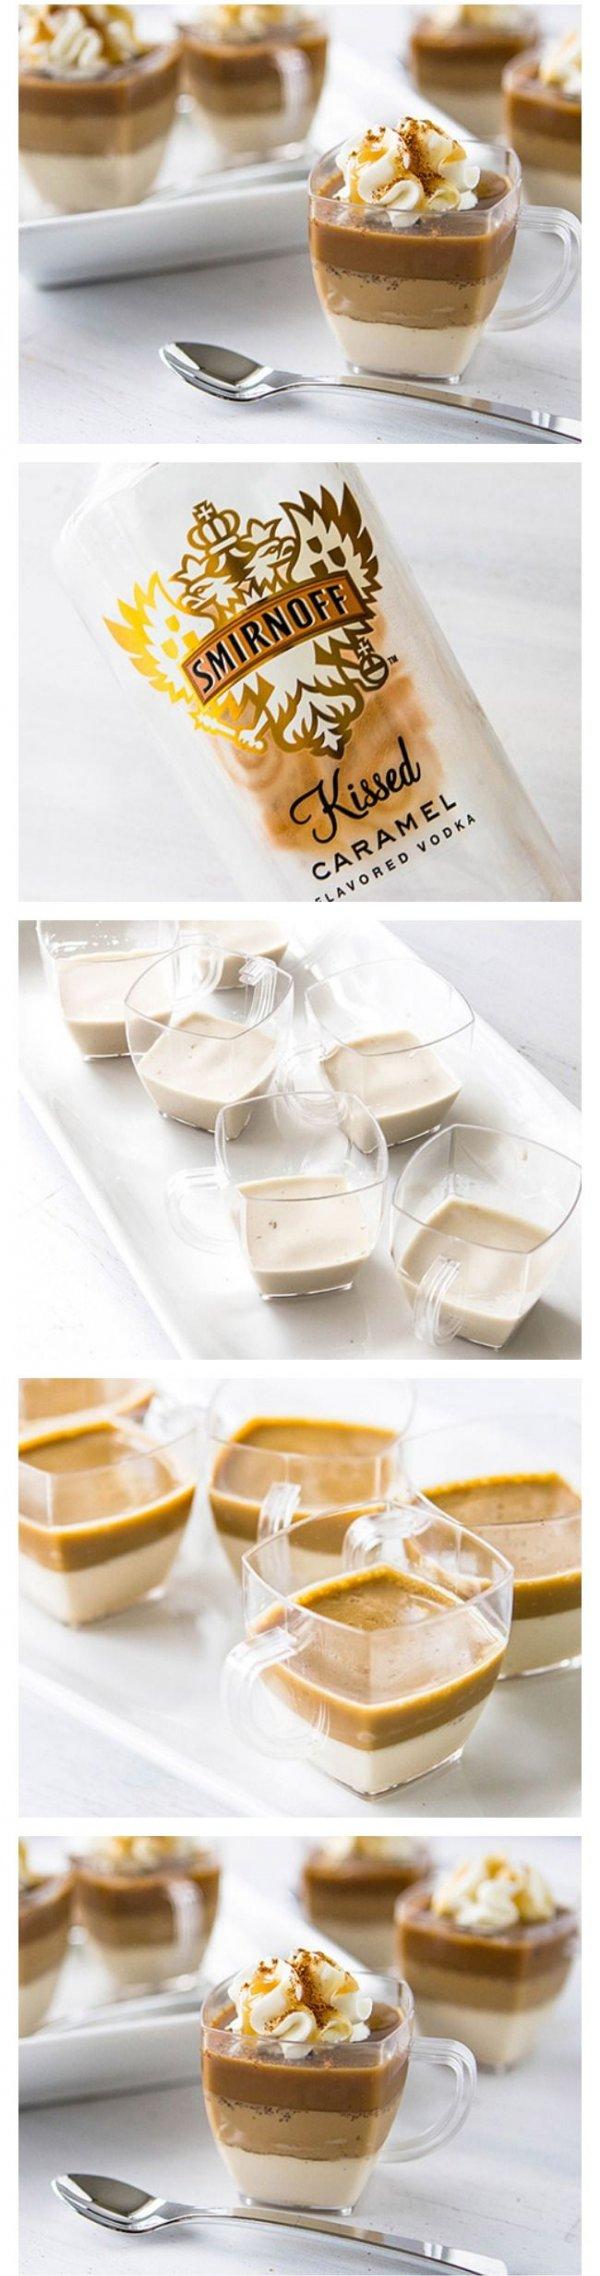 how to make jello pops